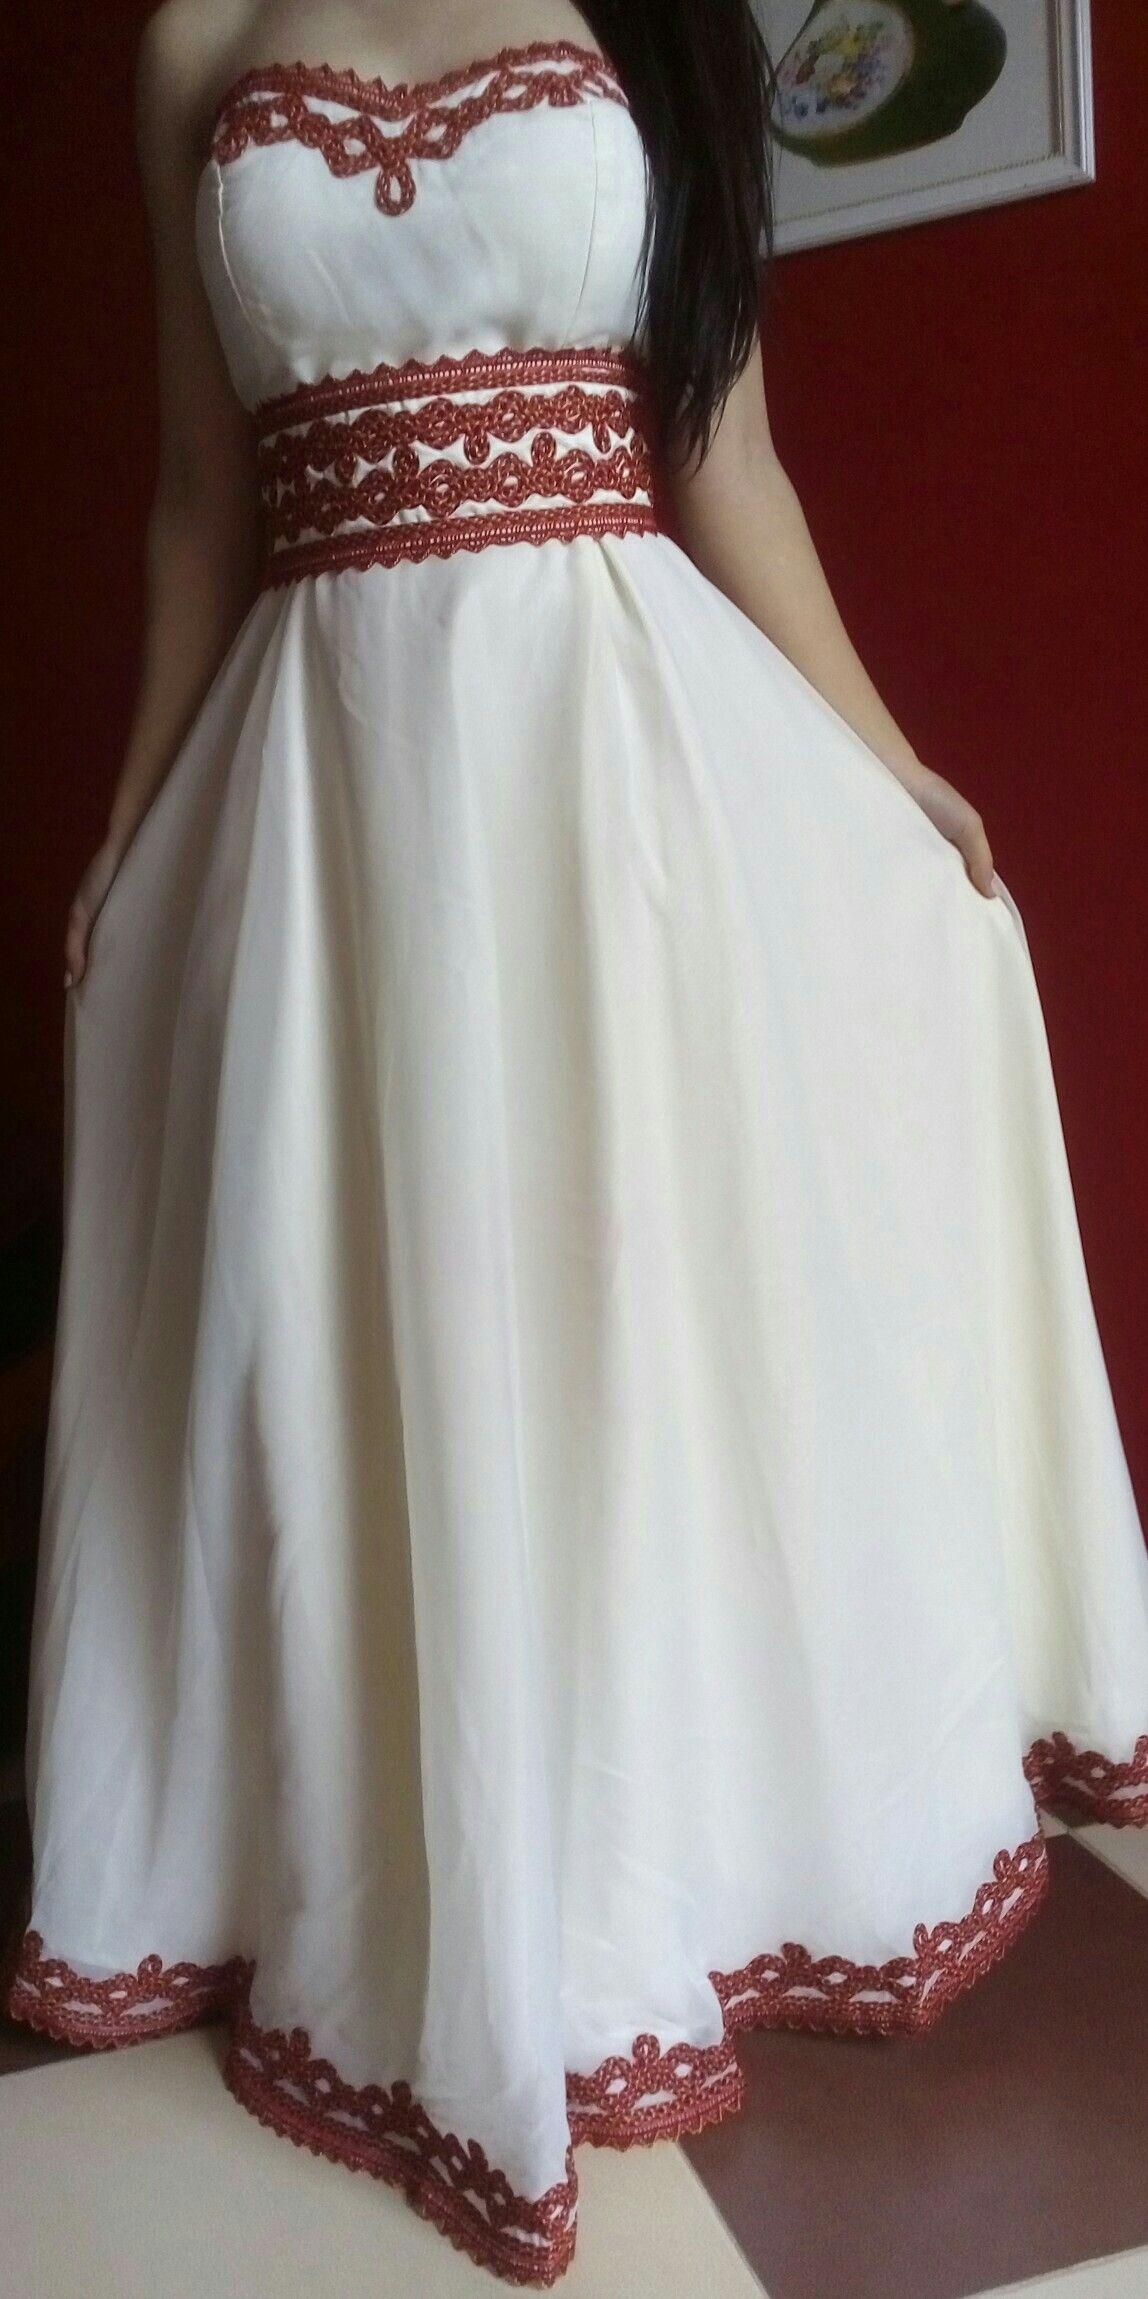 Pin by Dààlÿn Sewing\'s✂ on robe kabyle | Pinterest | Dressing gown